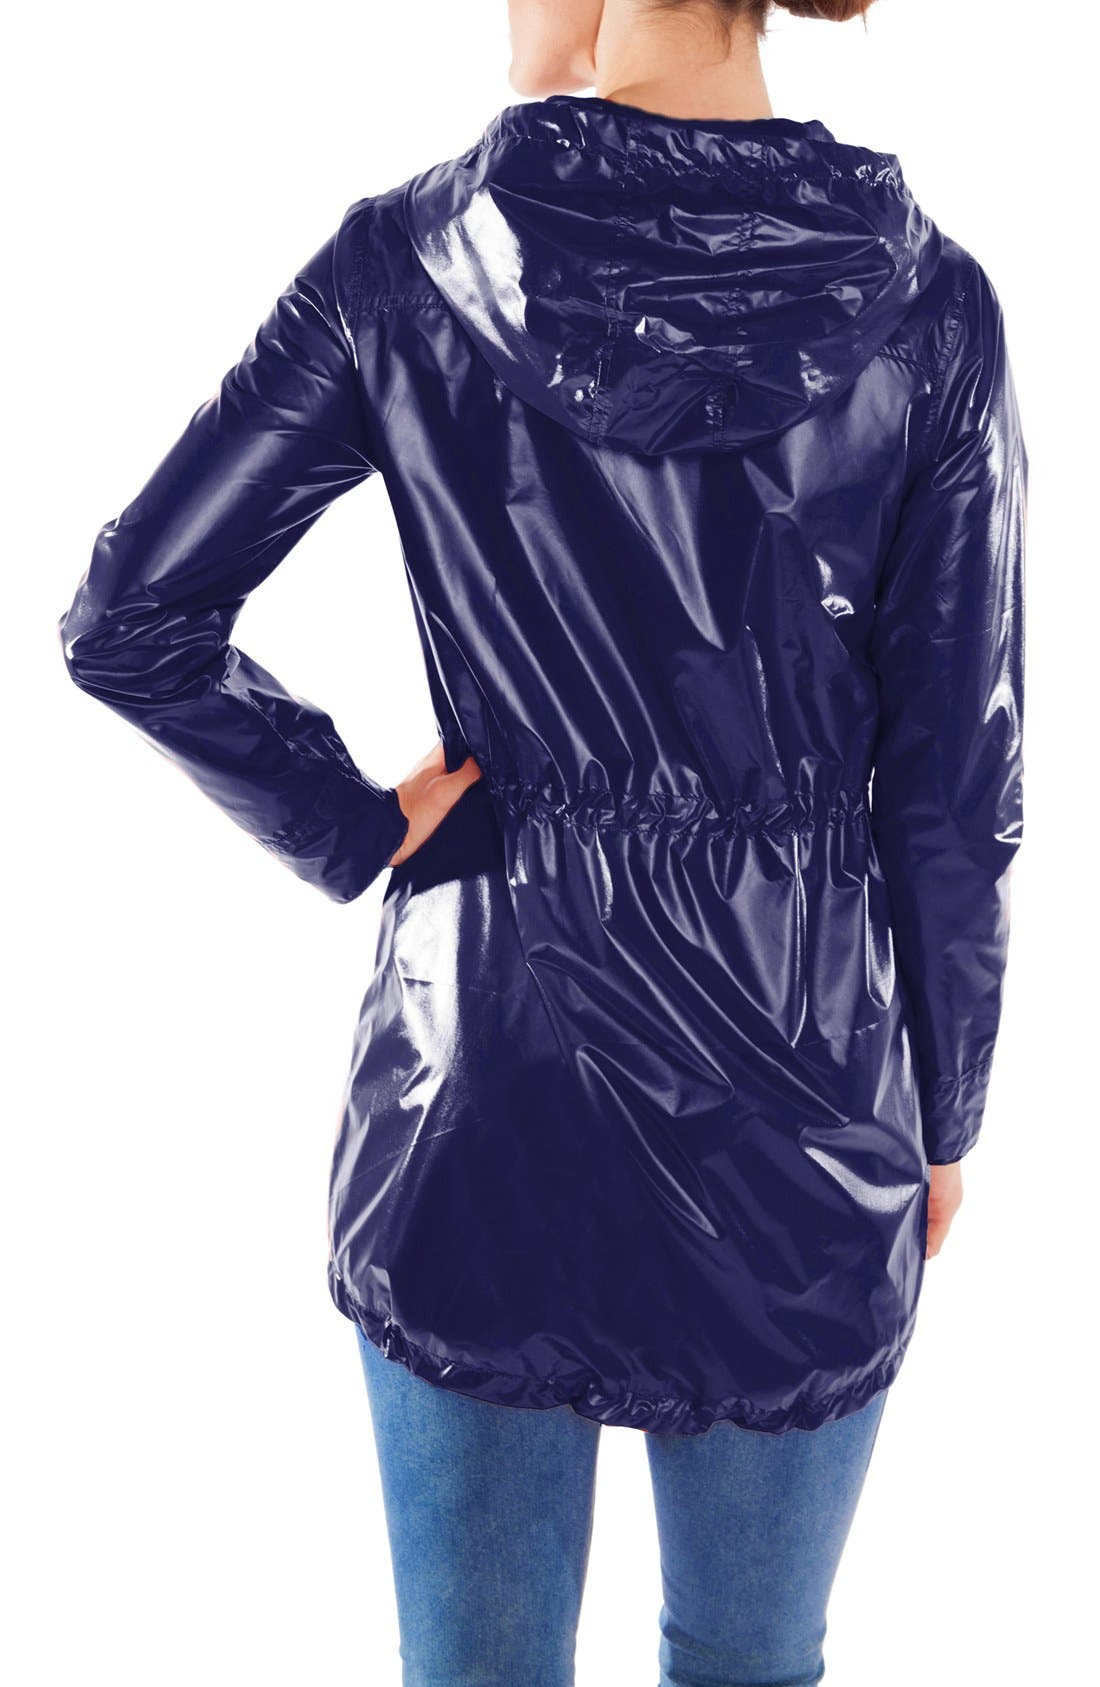 Waterproof Convertible 3-in-1 Maternity Raincoat,                             Alternate thumbnail 9, color,                             BRIGHT NAVY